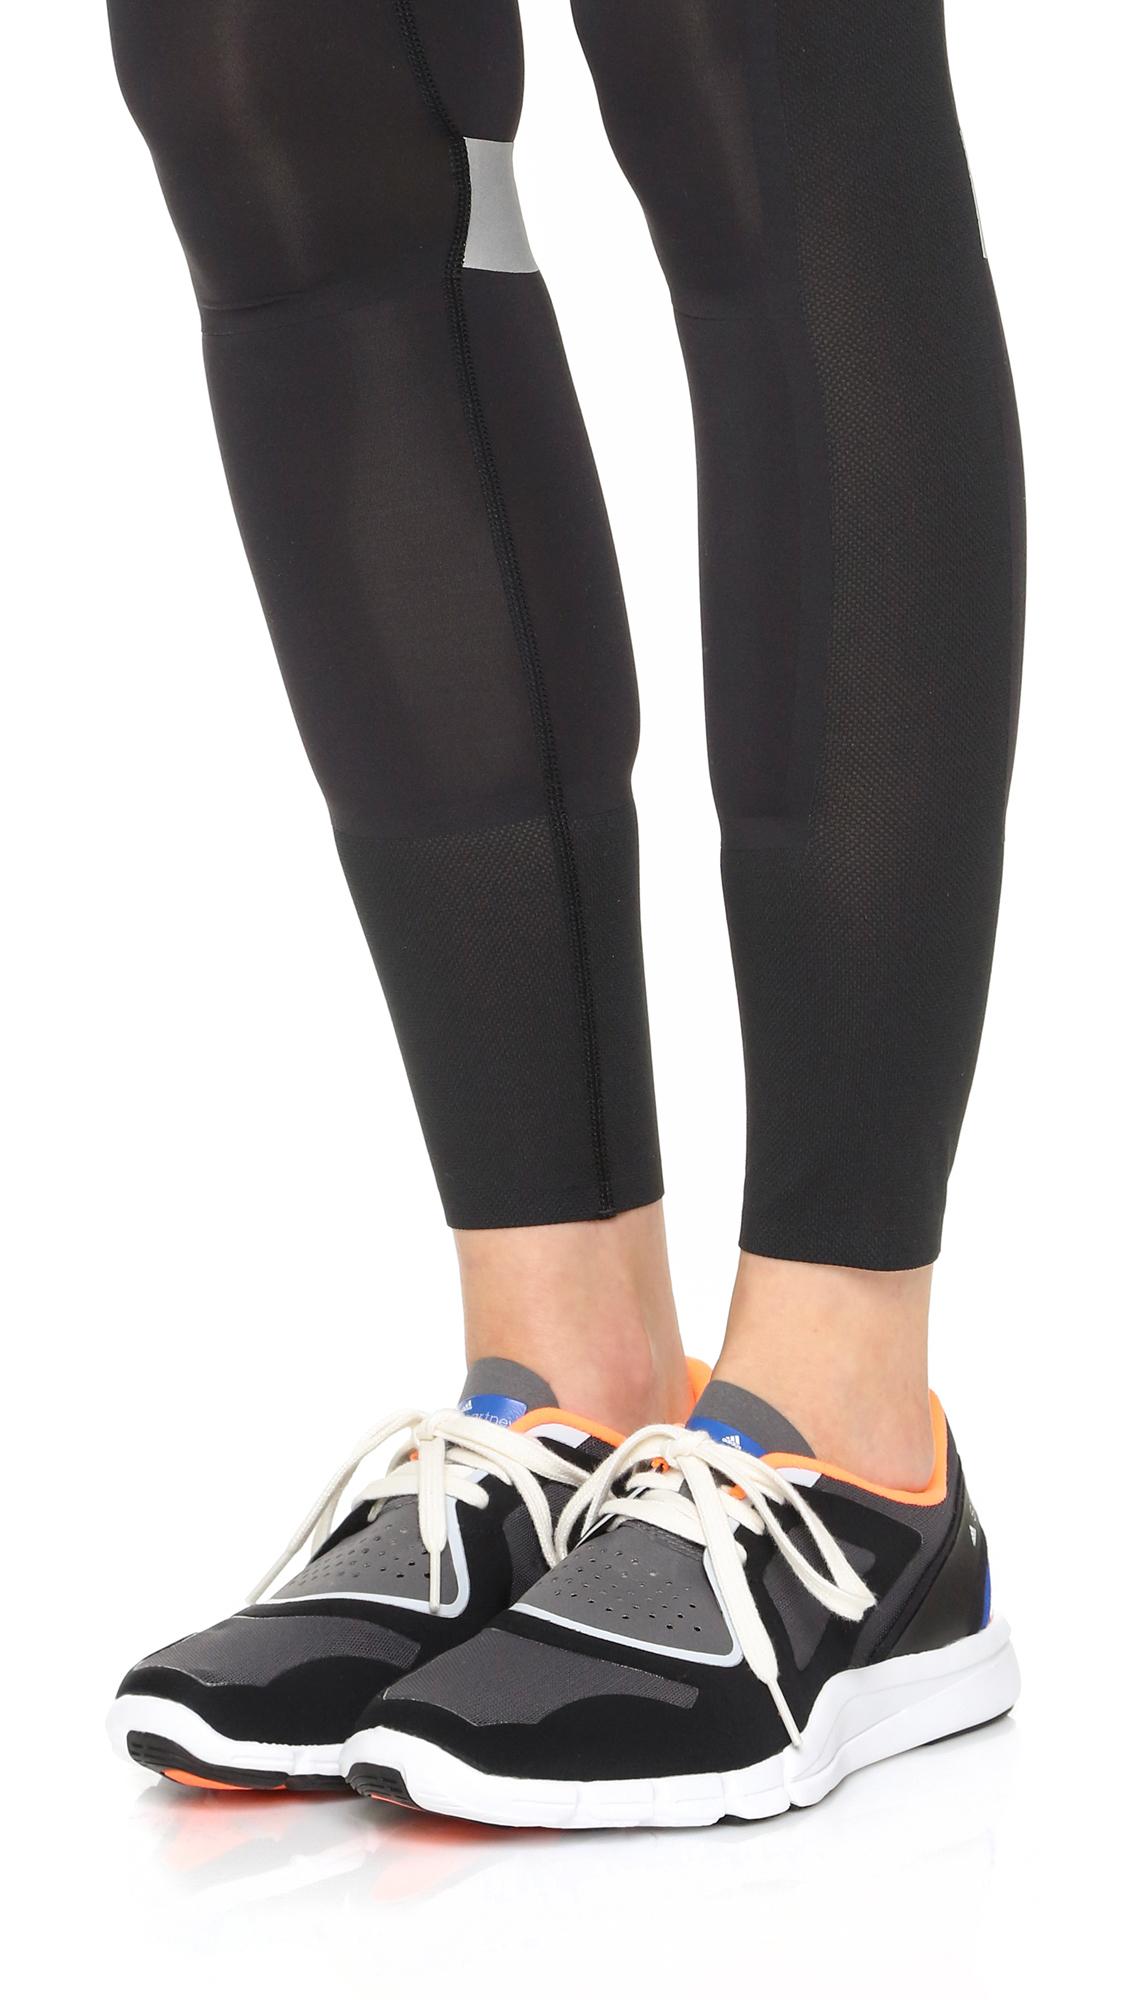 best cheap bc65a 524ba Stella Mccartney Nike Sneakers